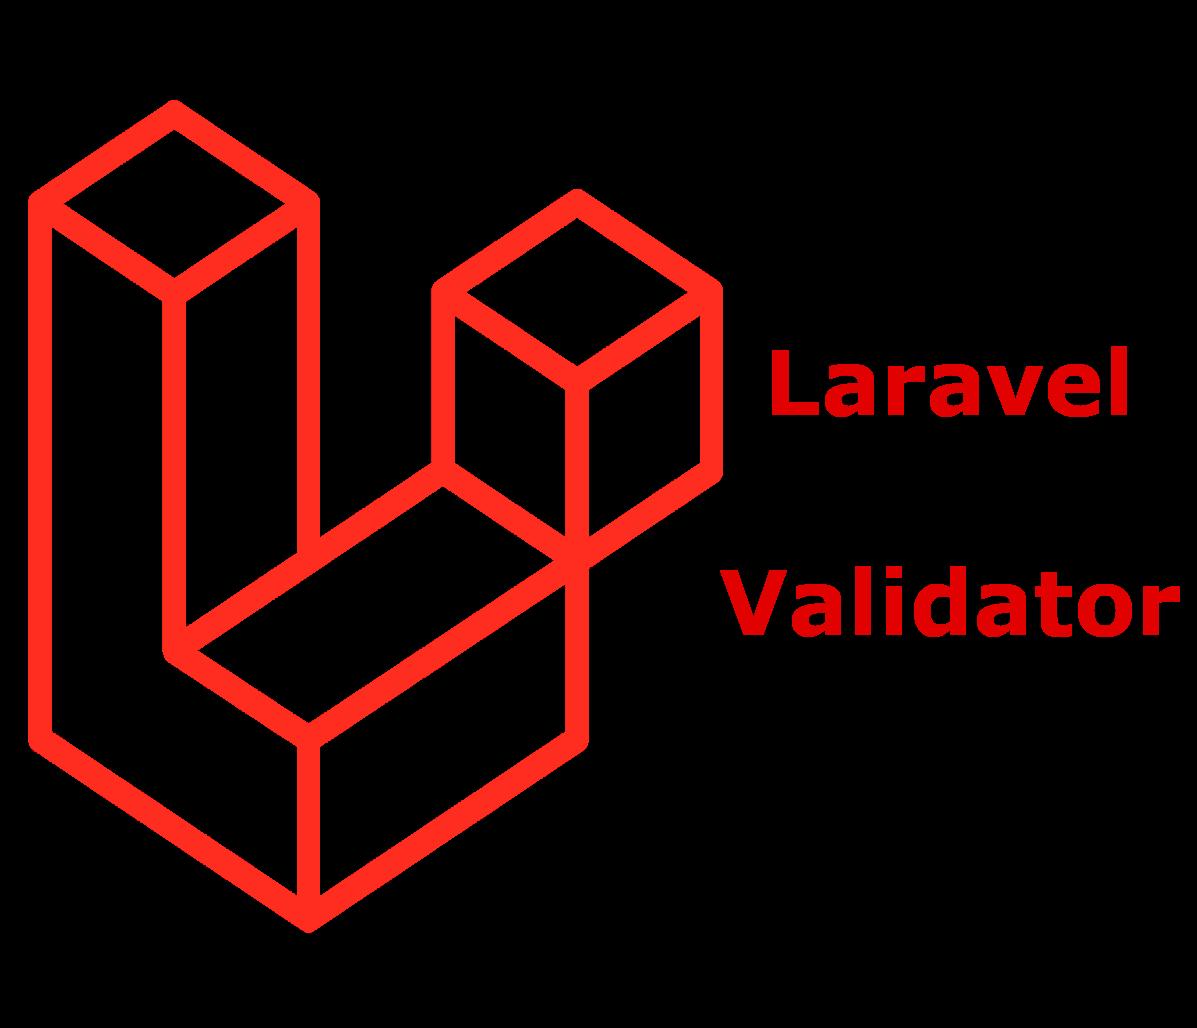 laravel validator